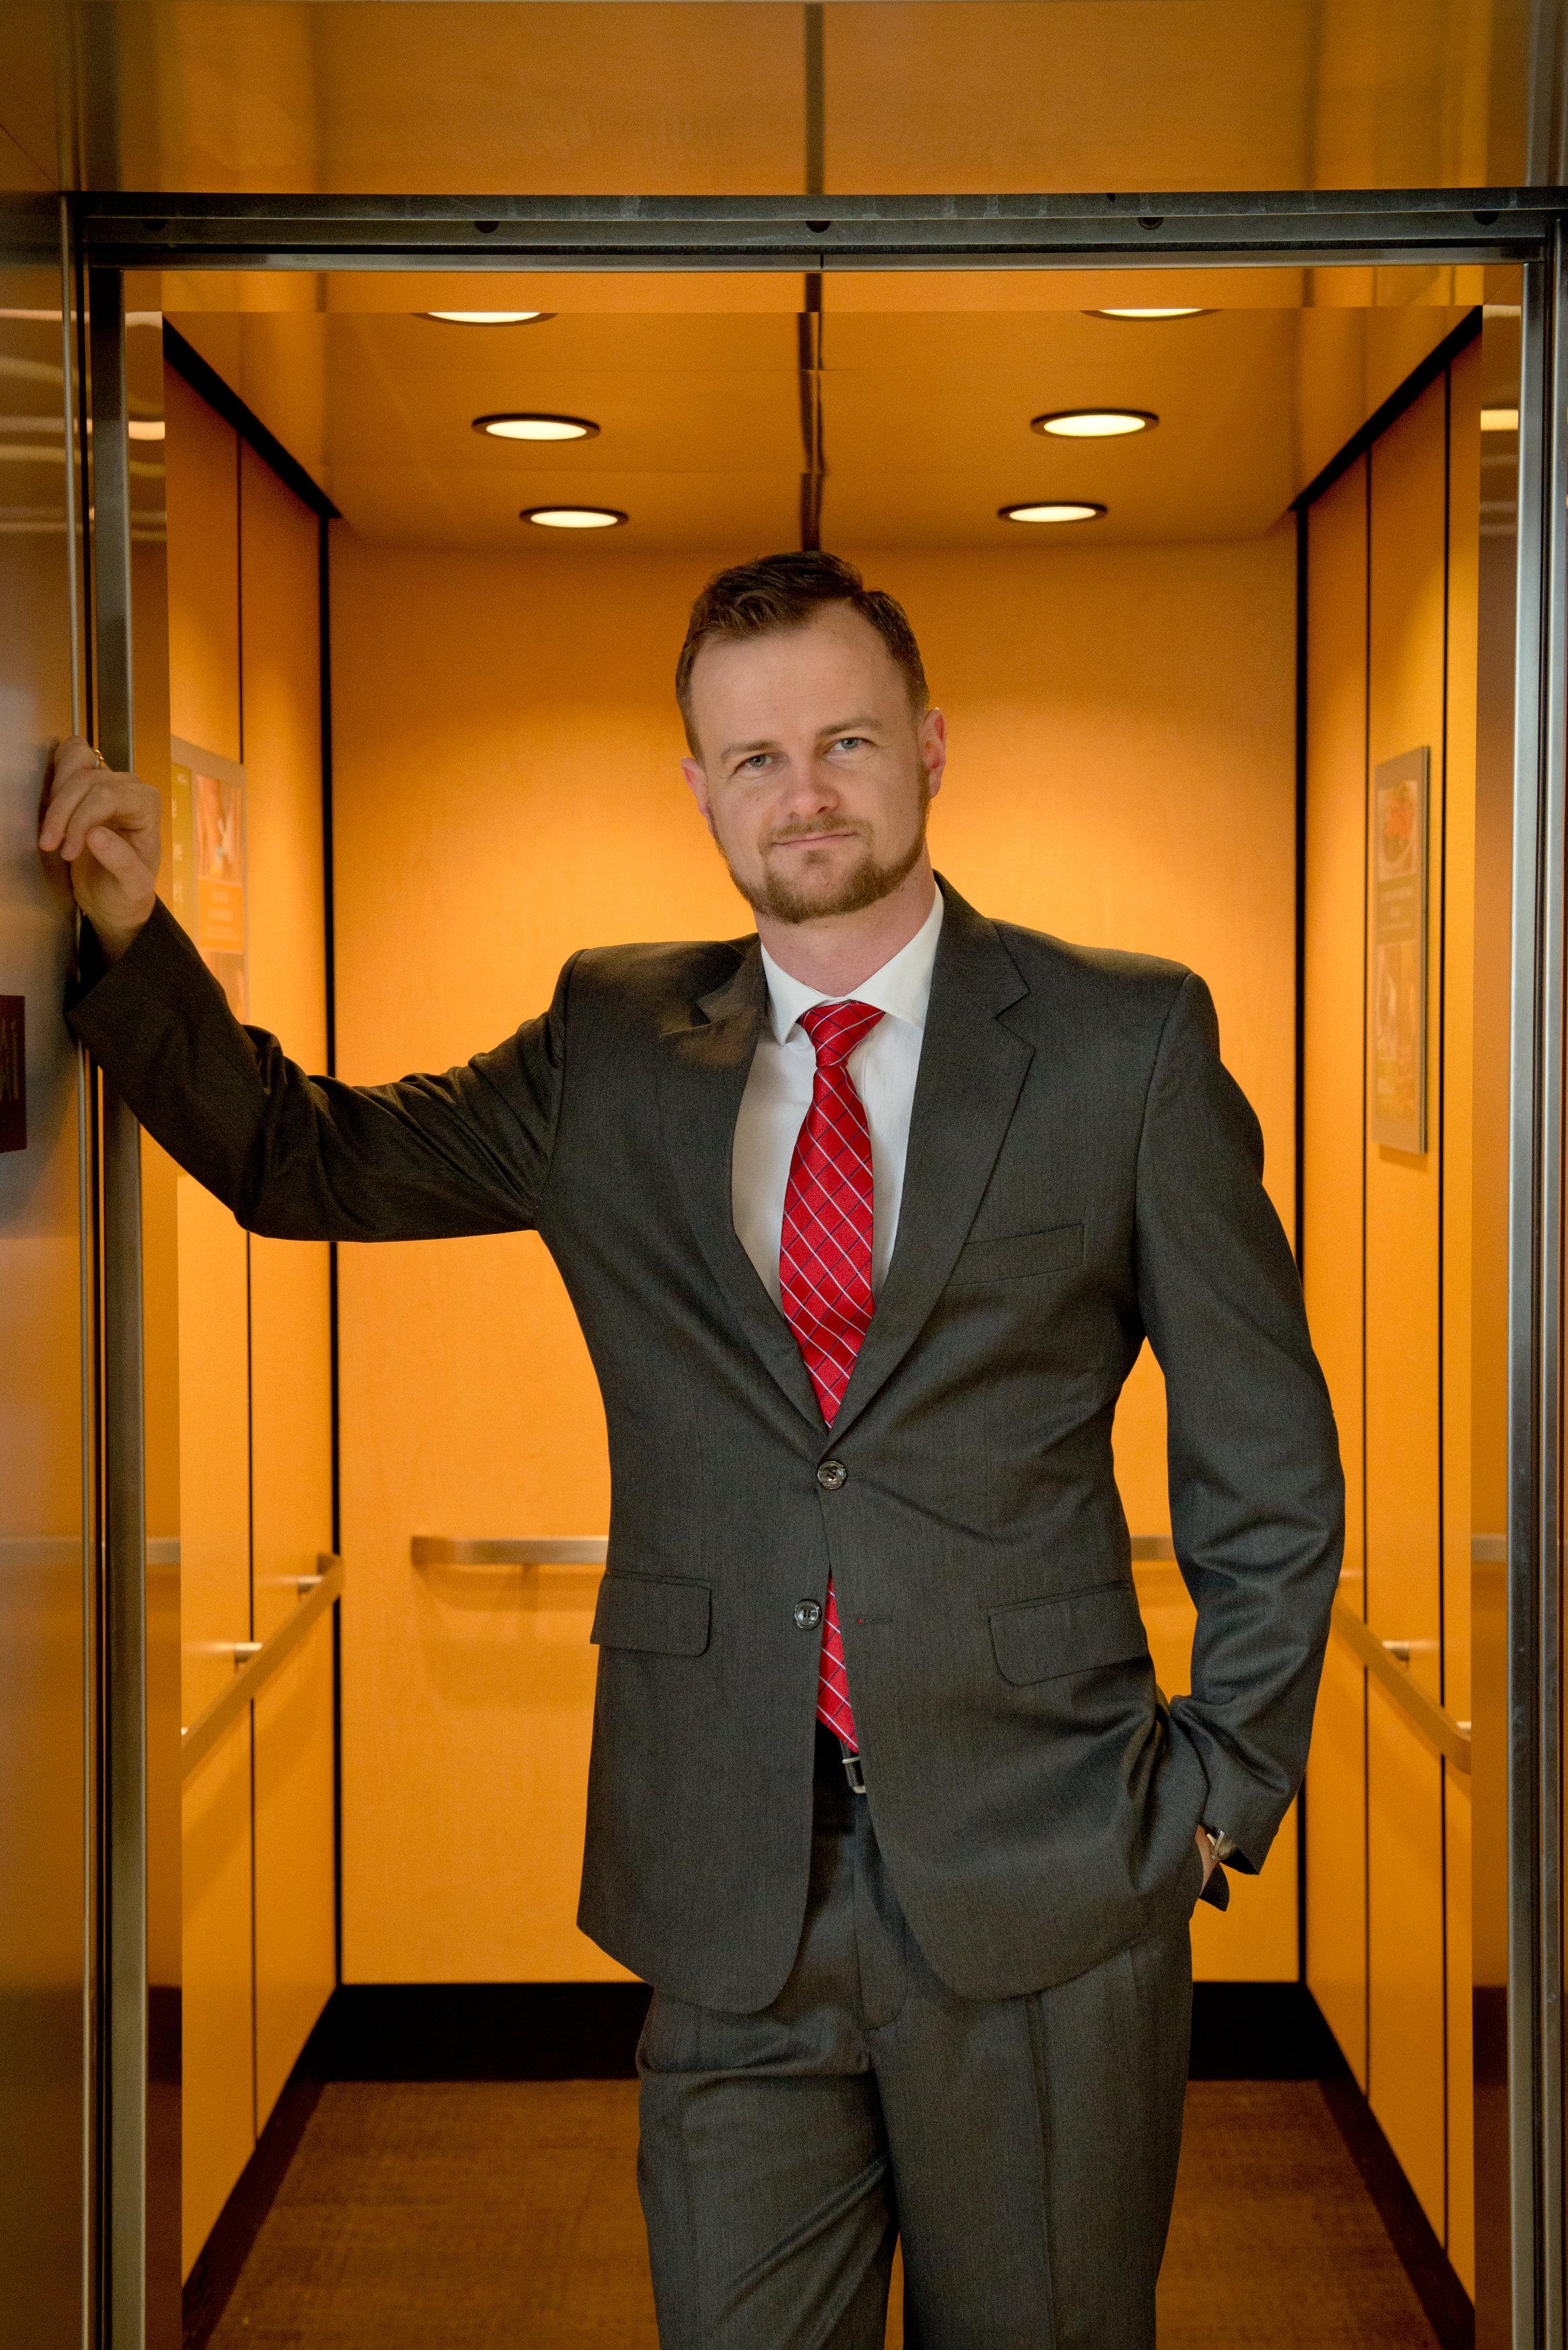 Orlando-senior-guy-elevator-suit.jpg